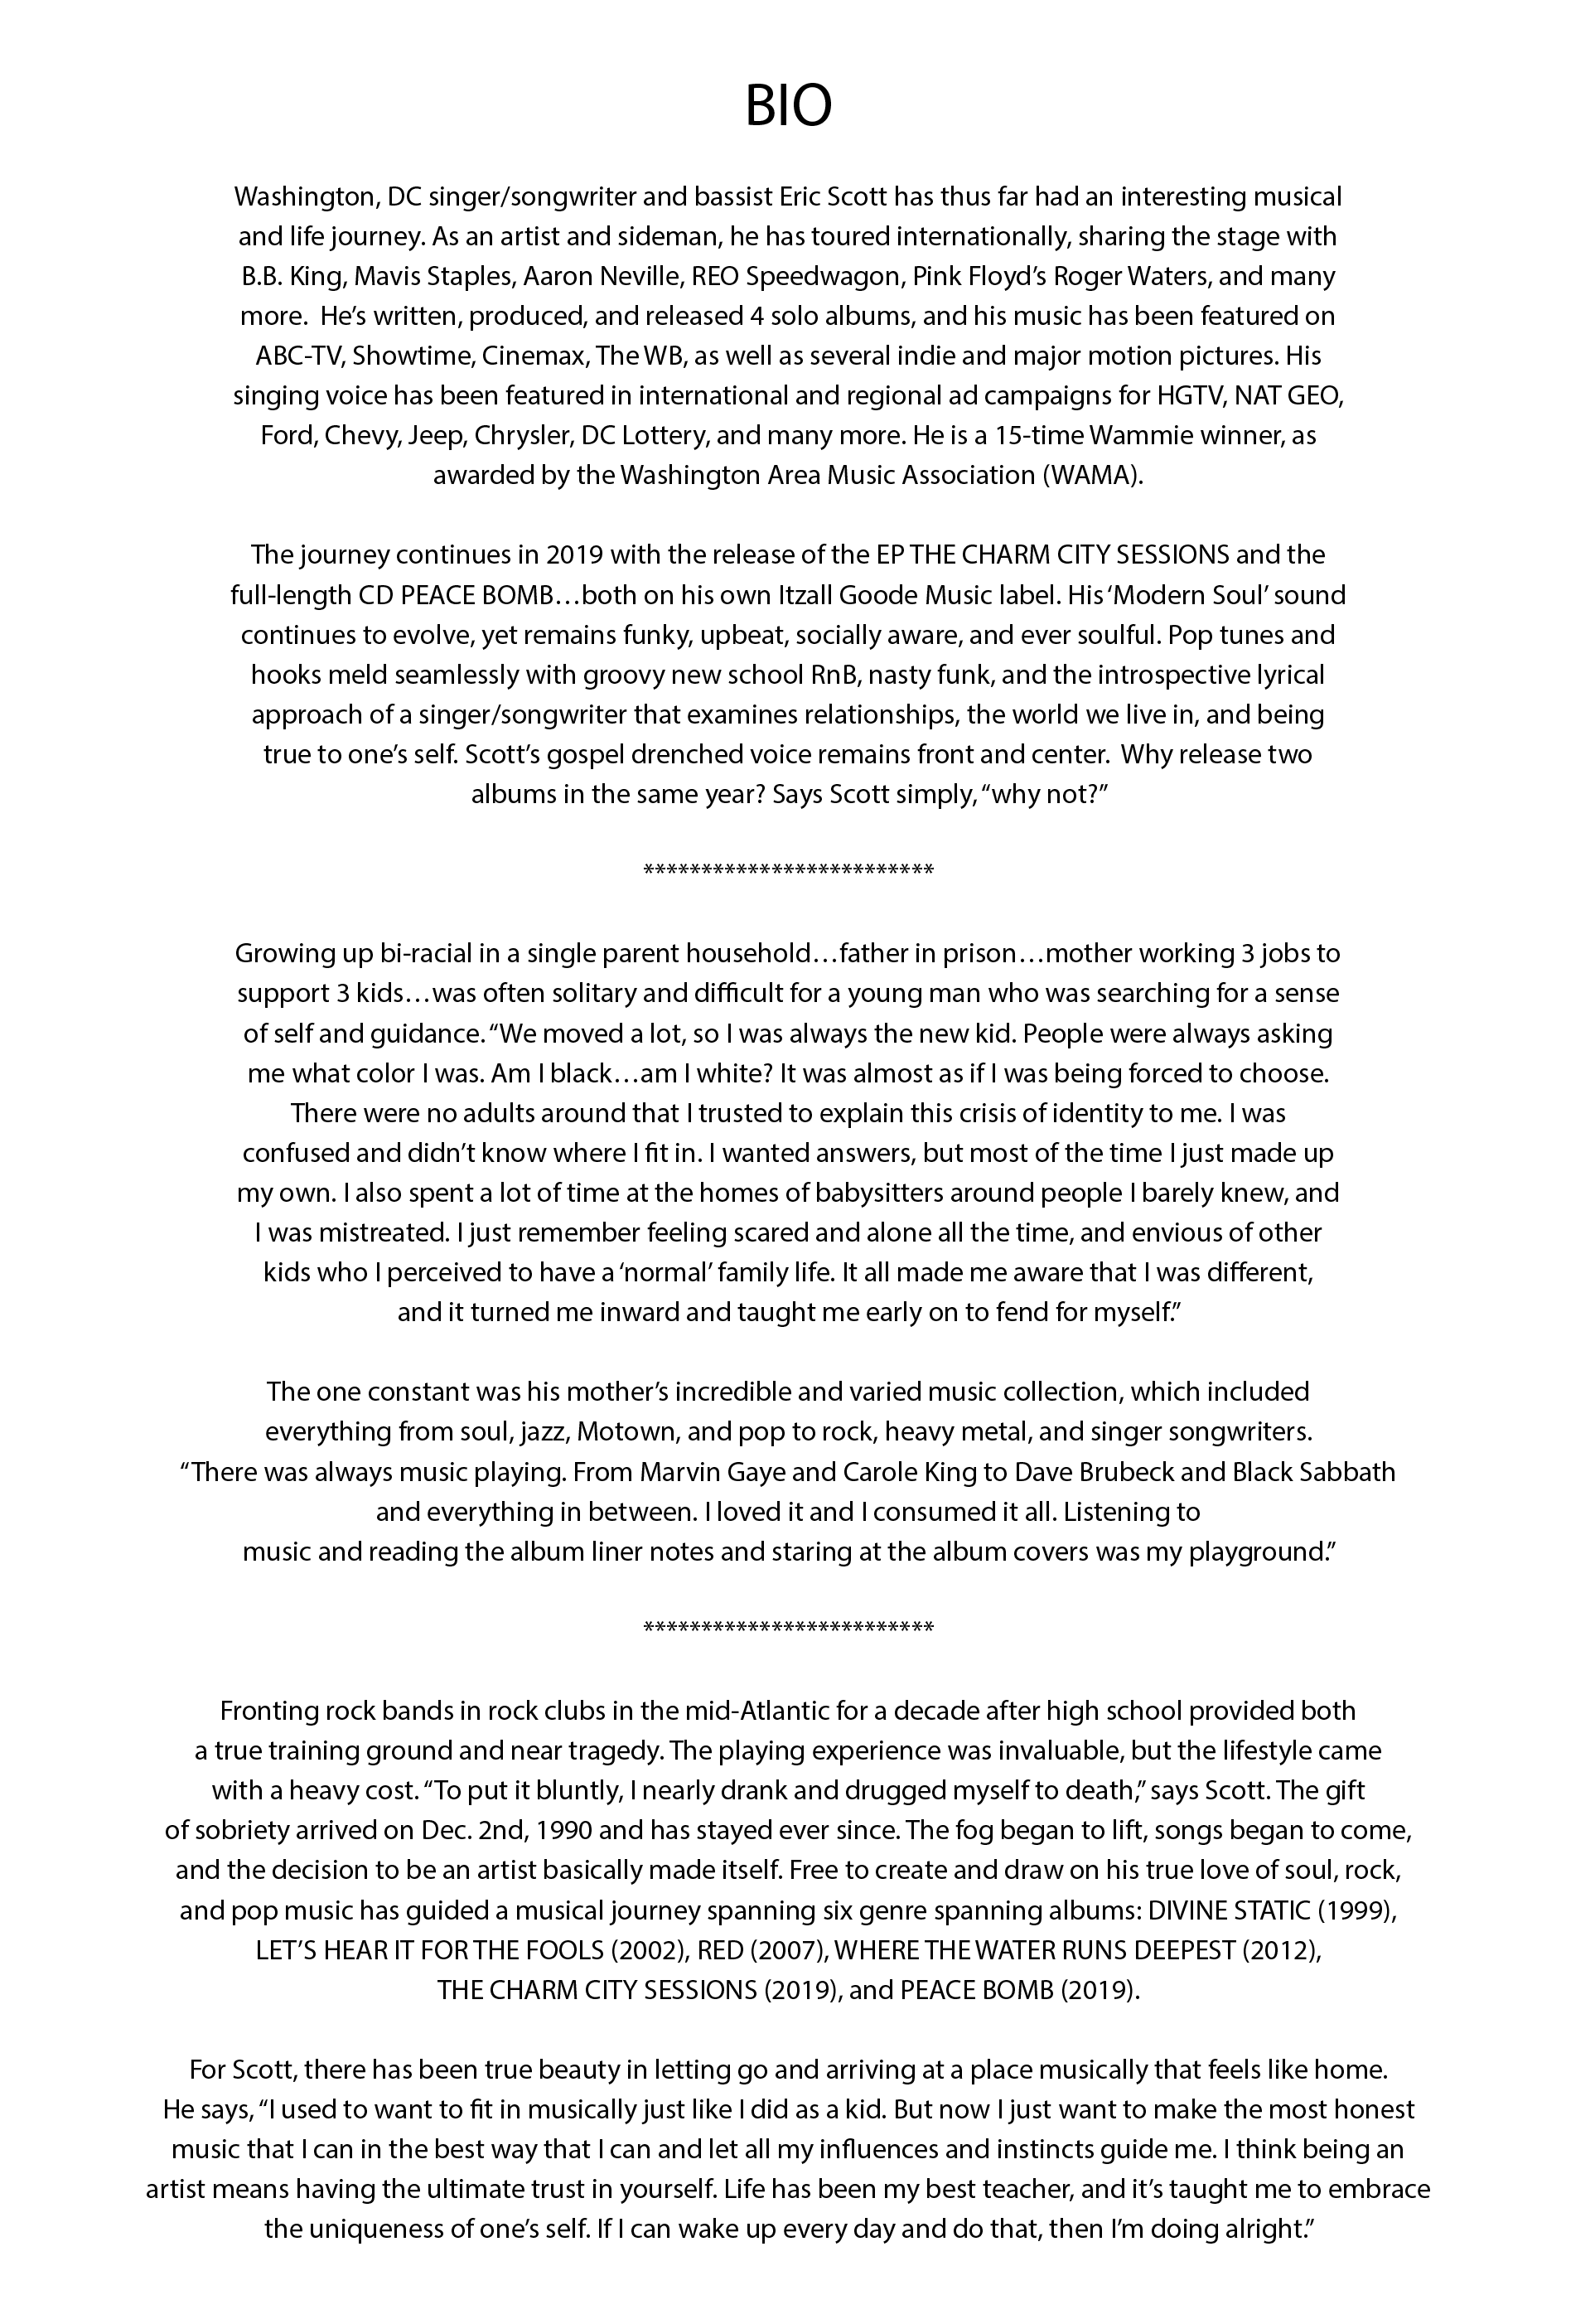 Bio4-01.png